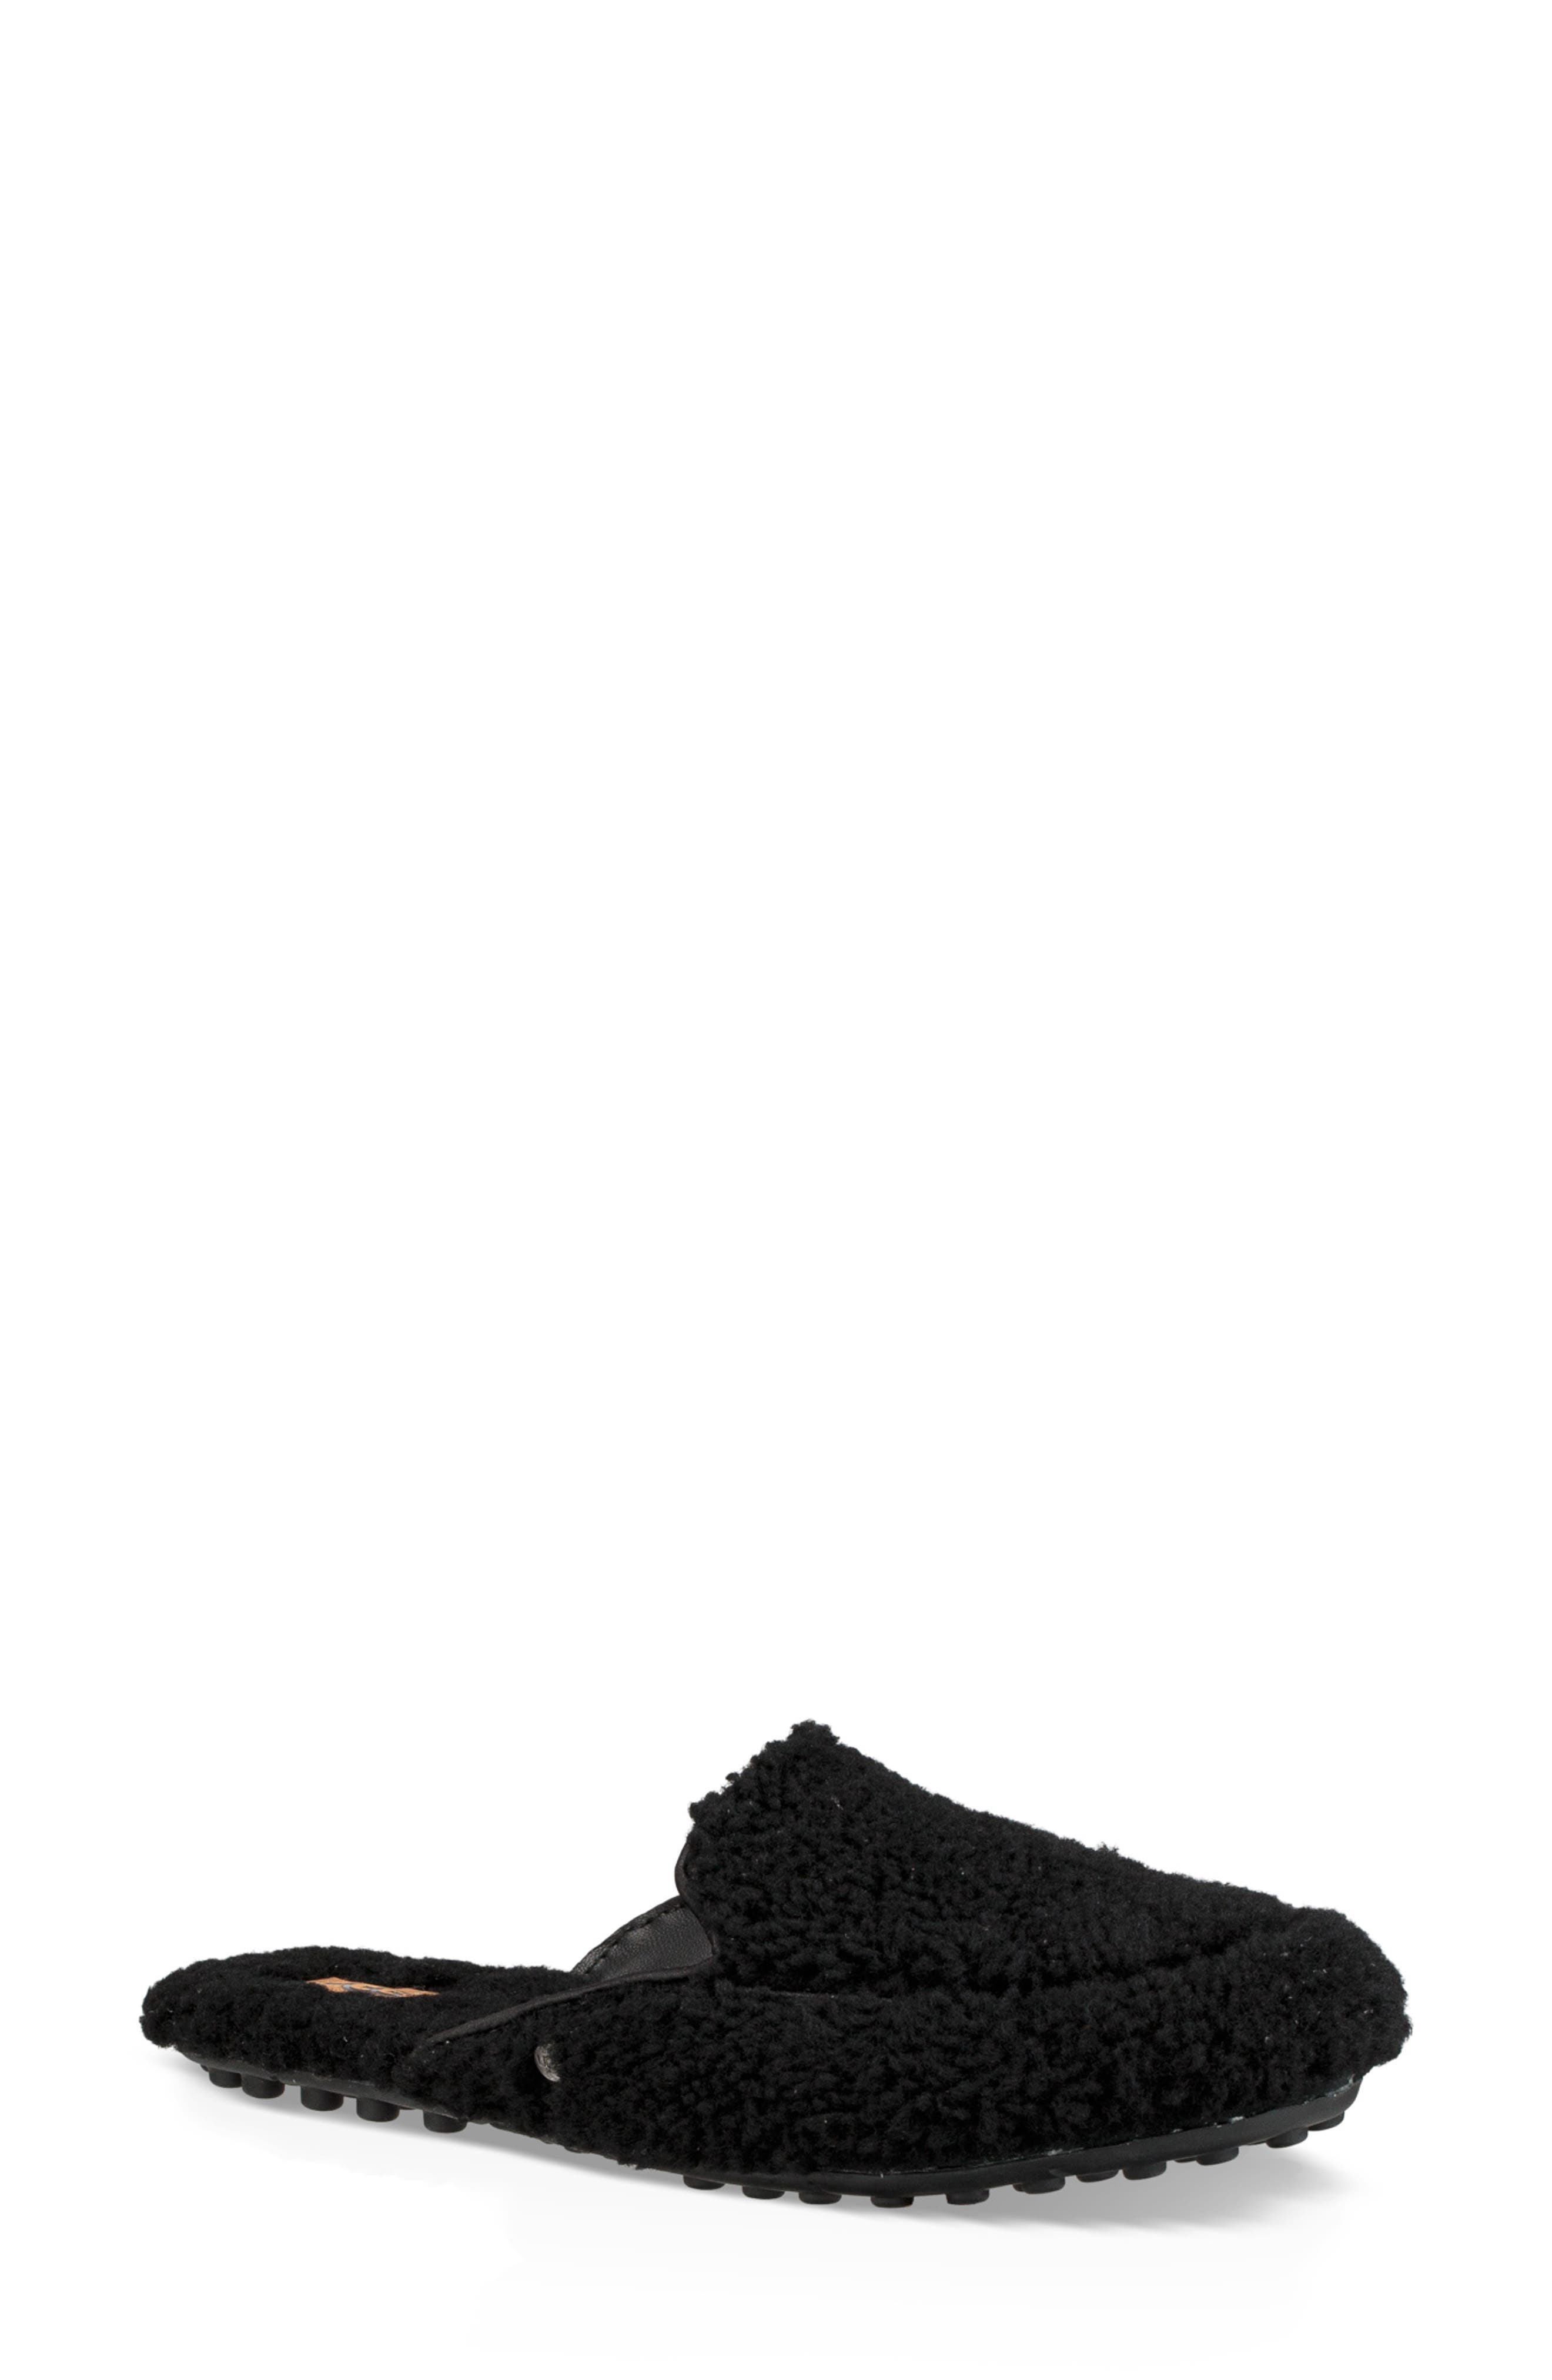 Ugg Lane Fluff Genuine Shearling Loafer Slipper